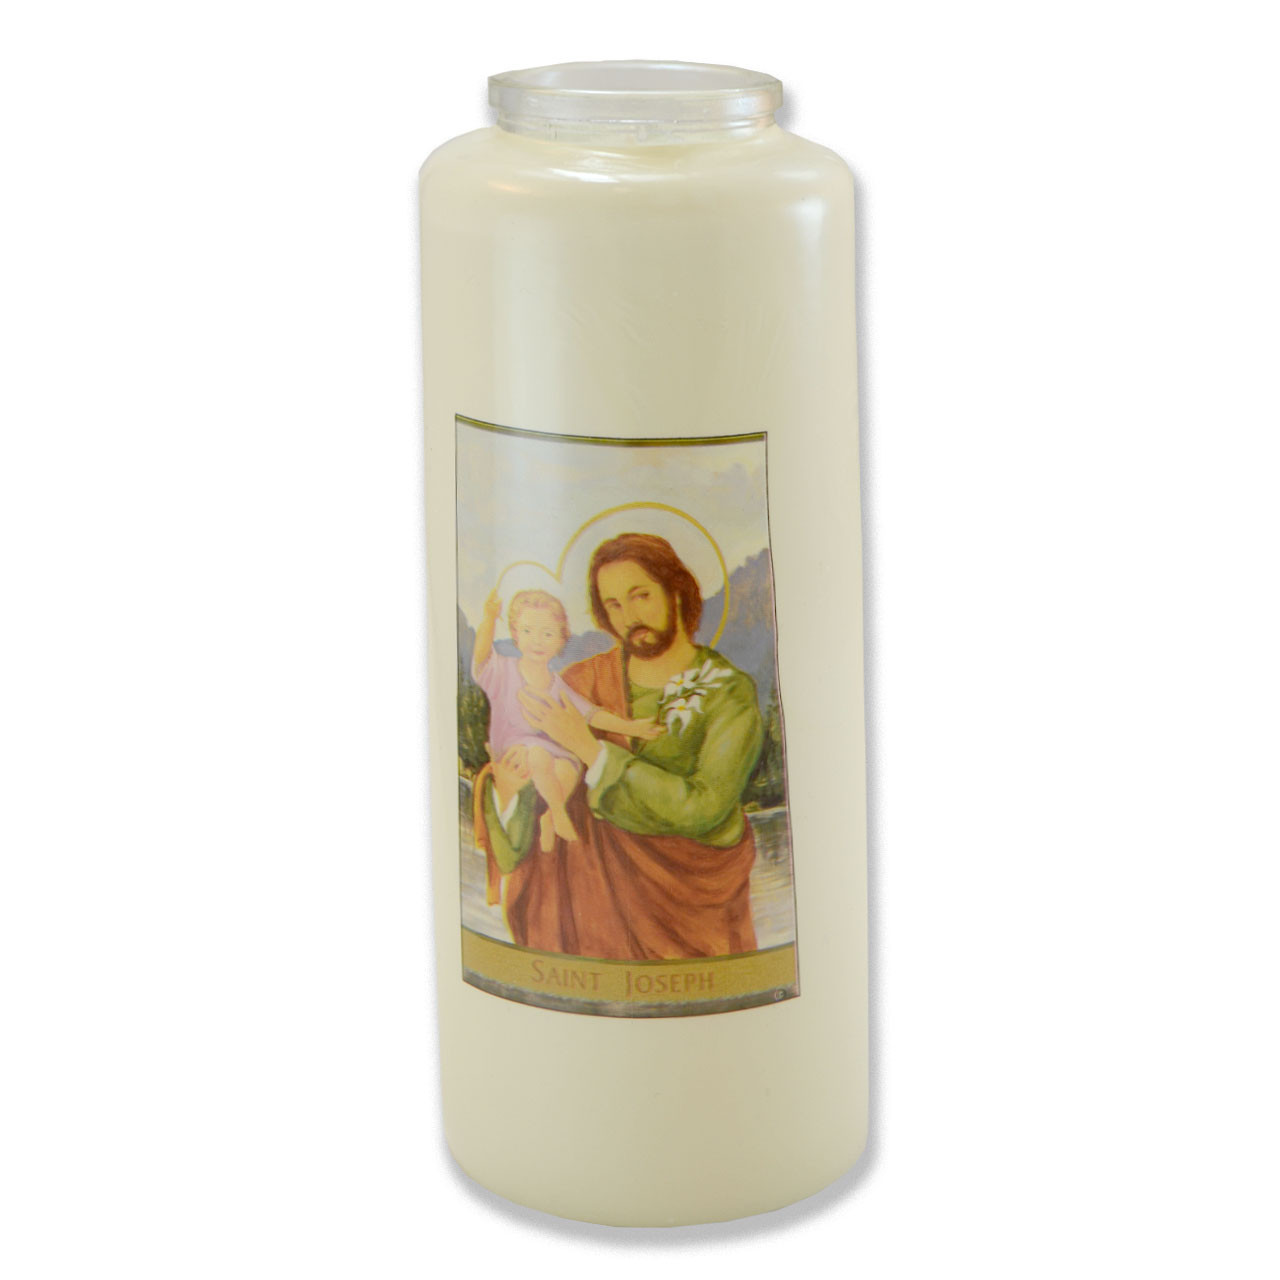 6-Day St. Joseph Candle